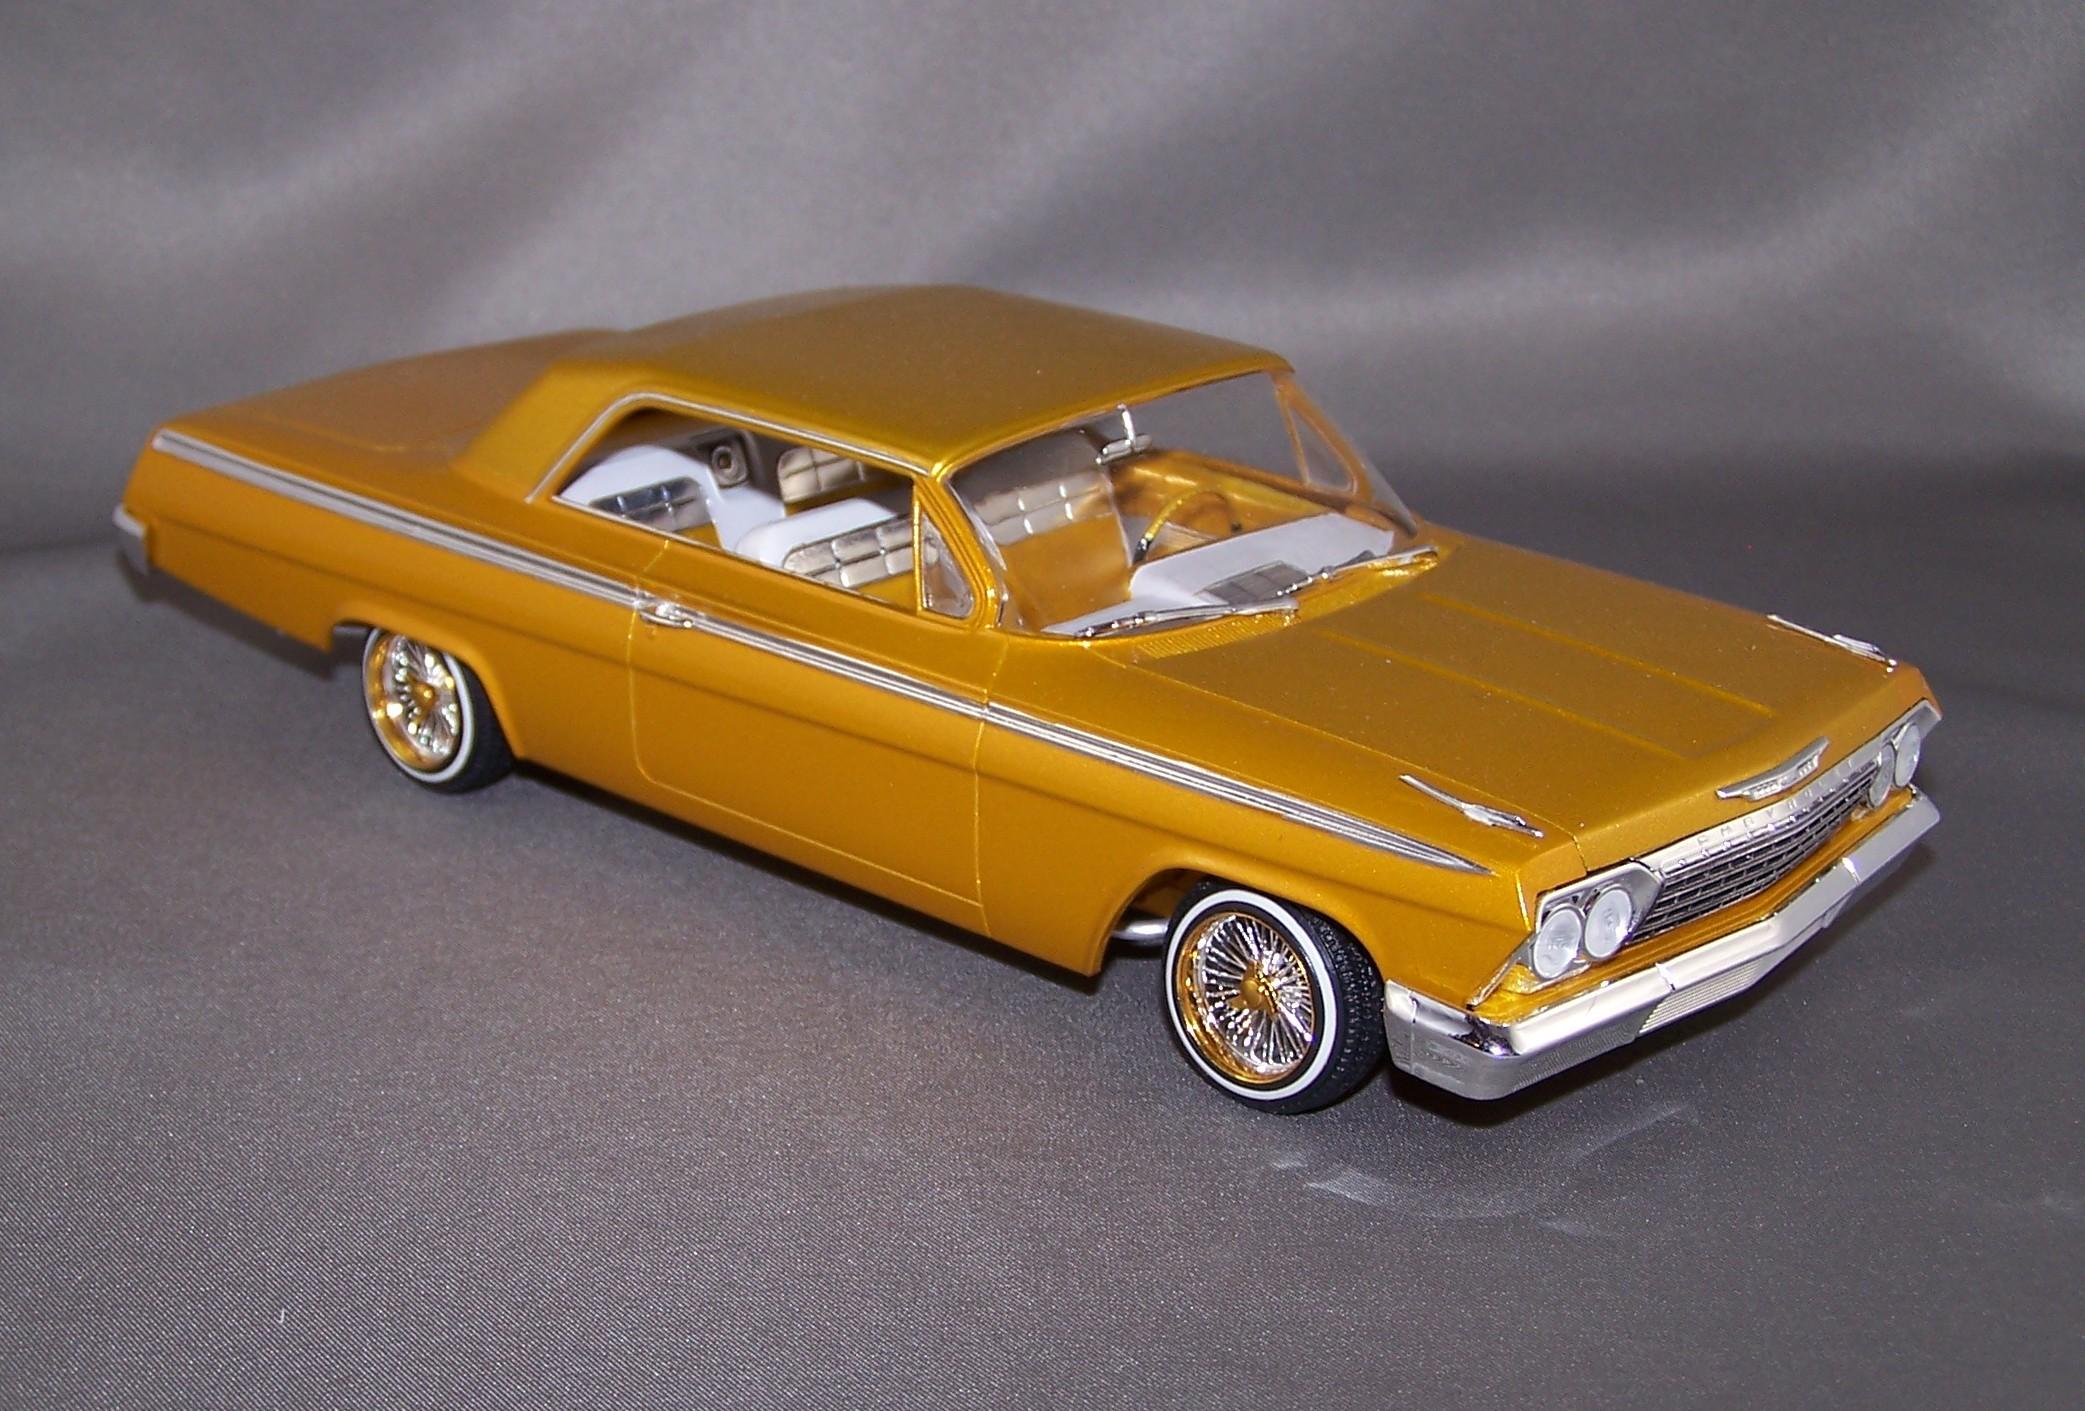 Chevy Impala Lowrider Wallpaper 1962 Chevy Impala Lowrider